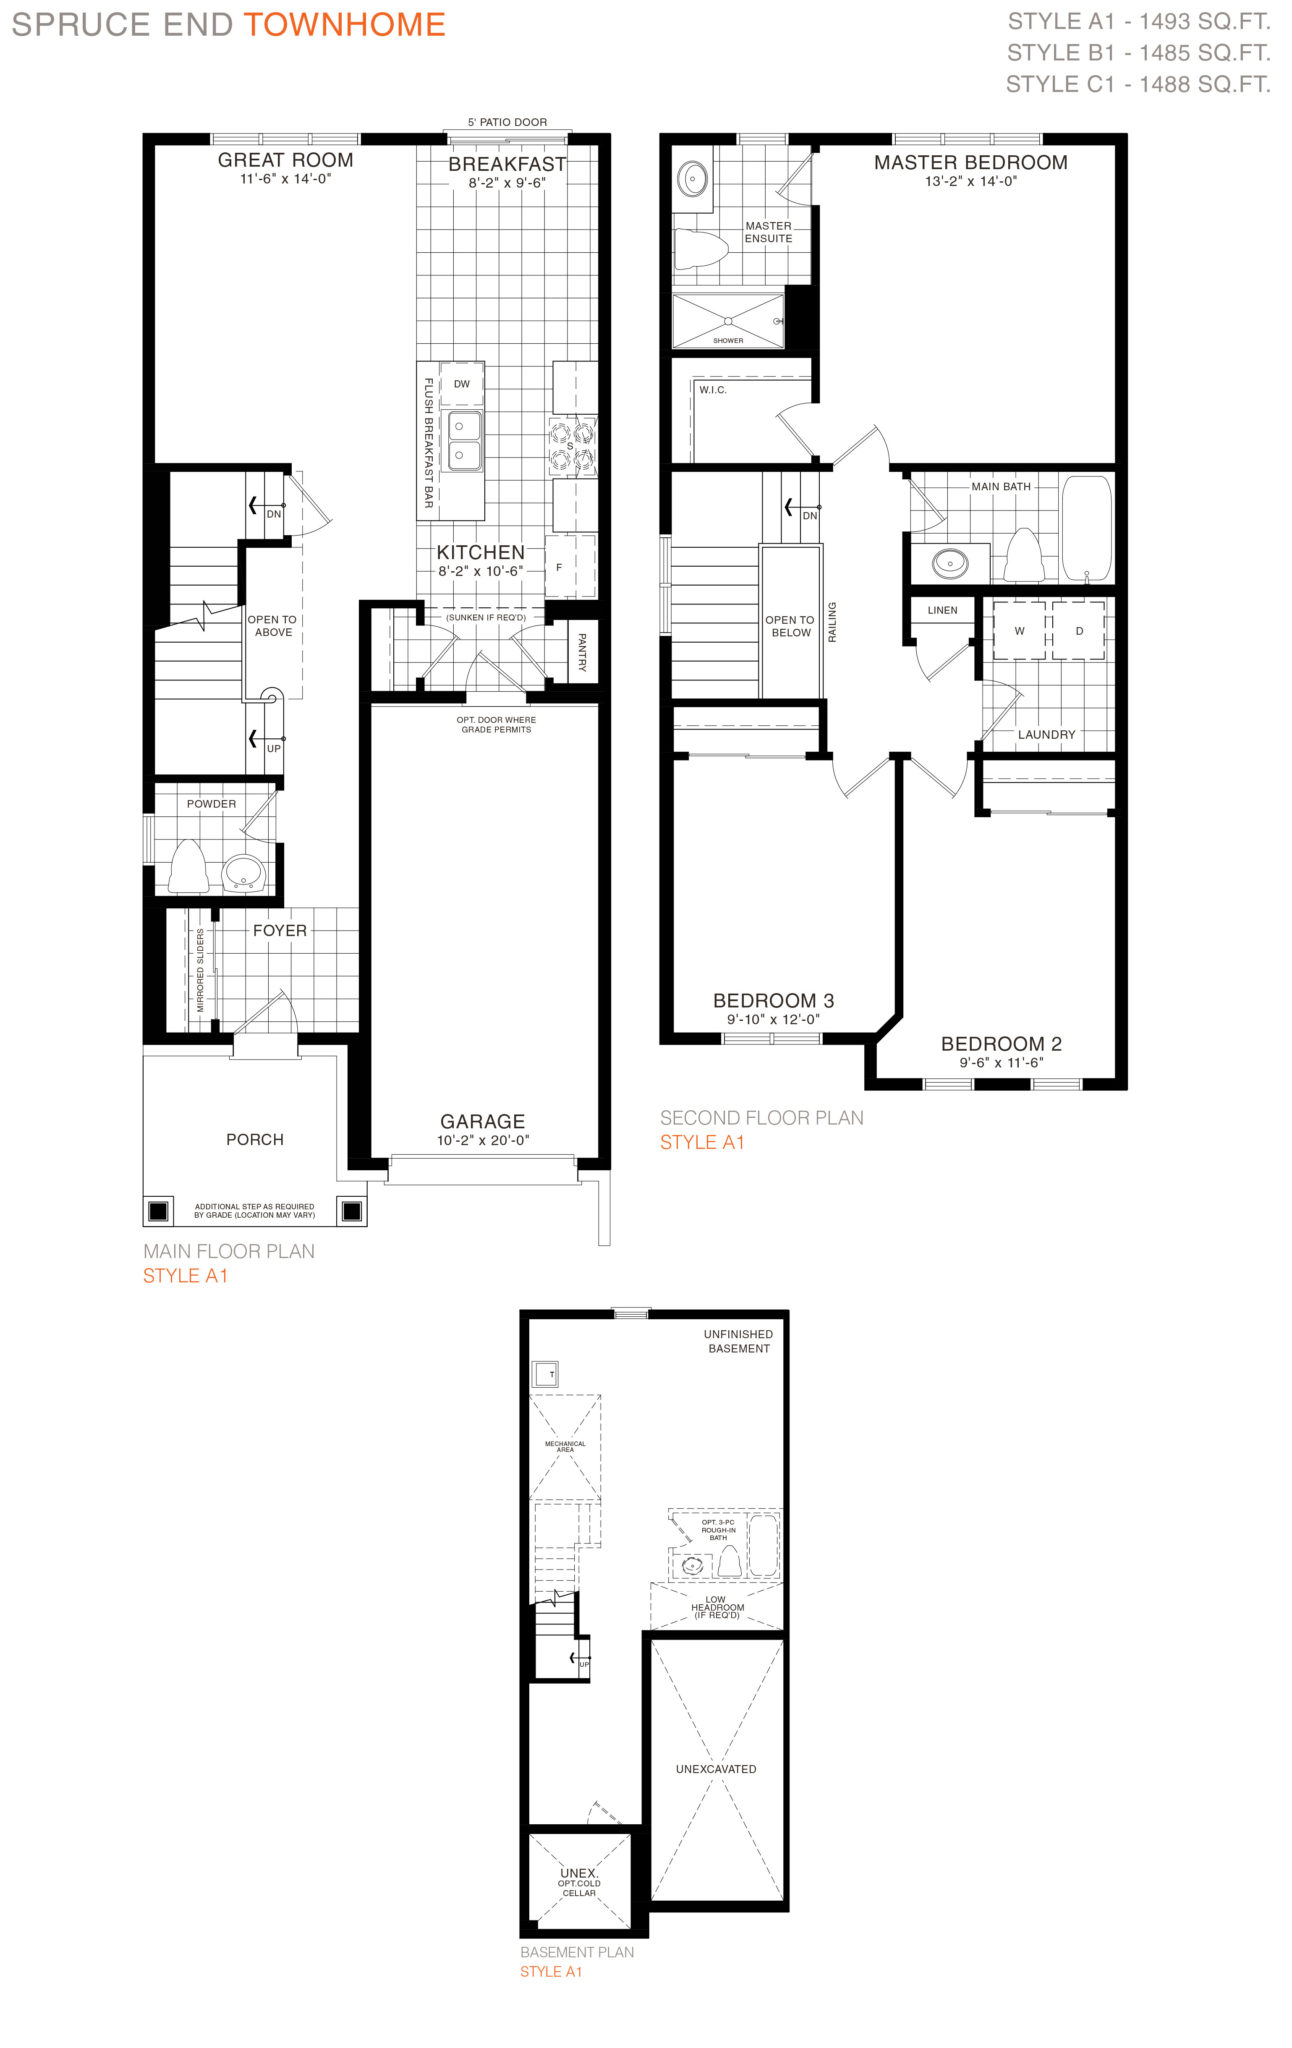 Spruce-End-Townhome-fp-spruce-end-townhome-product-2